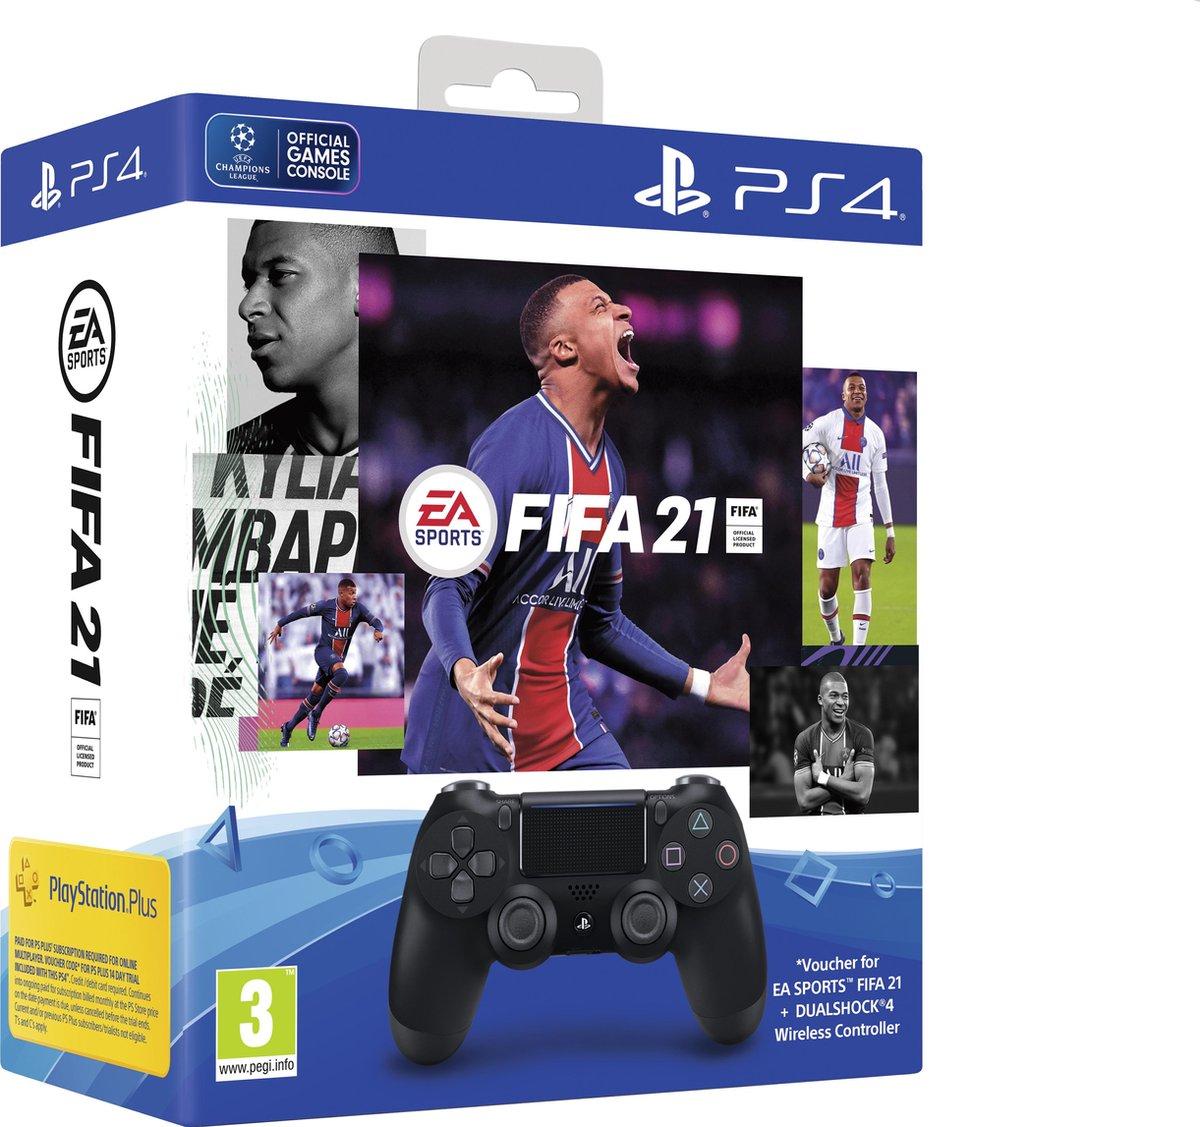 Sony DualShock 4 V2 + FIFA 21 + PS plus 14 dagen @ Amazon.de (Prime)